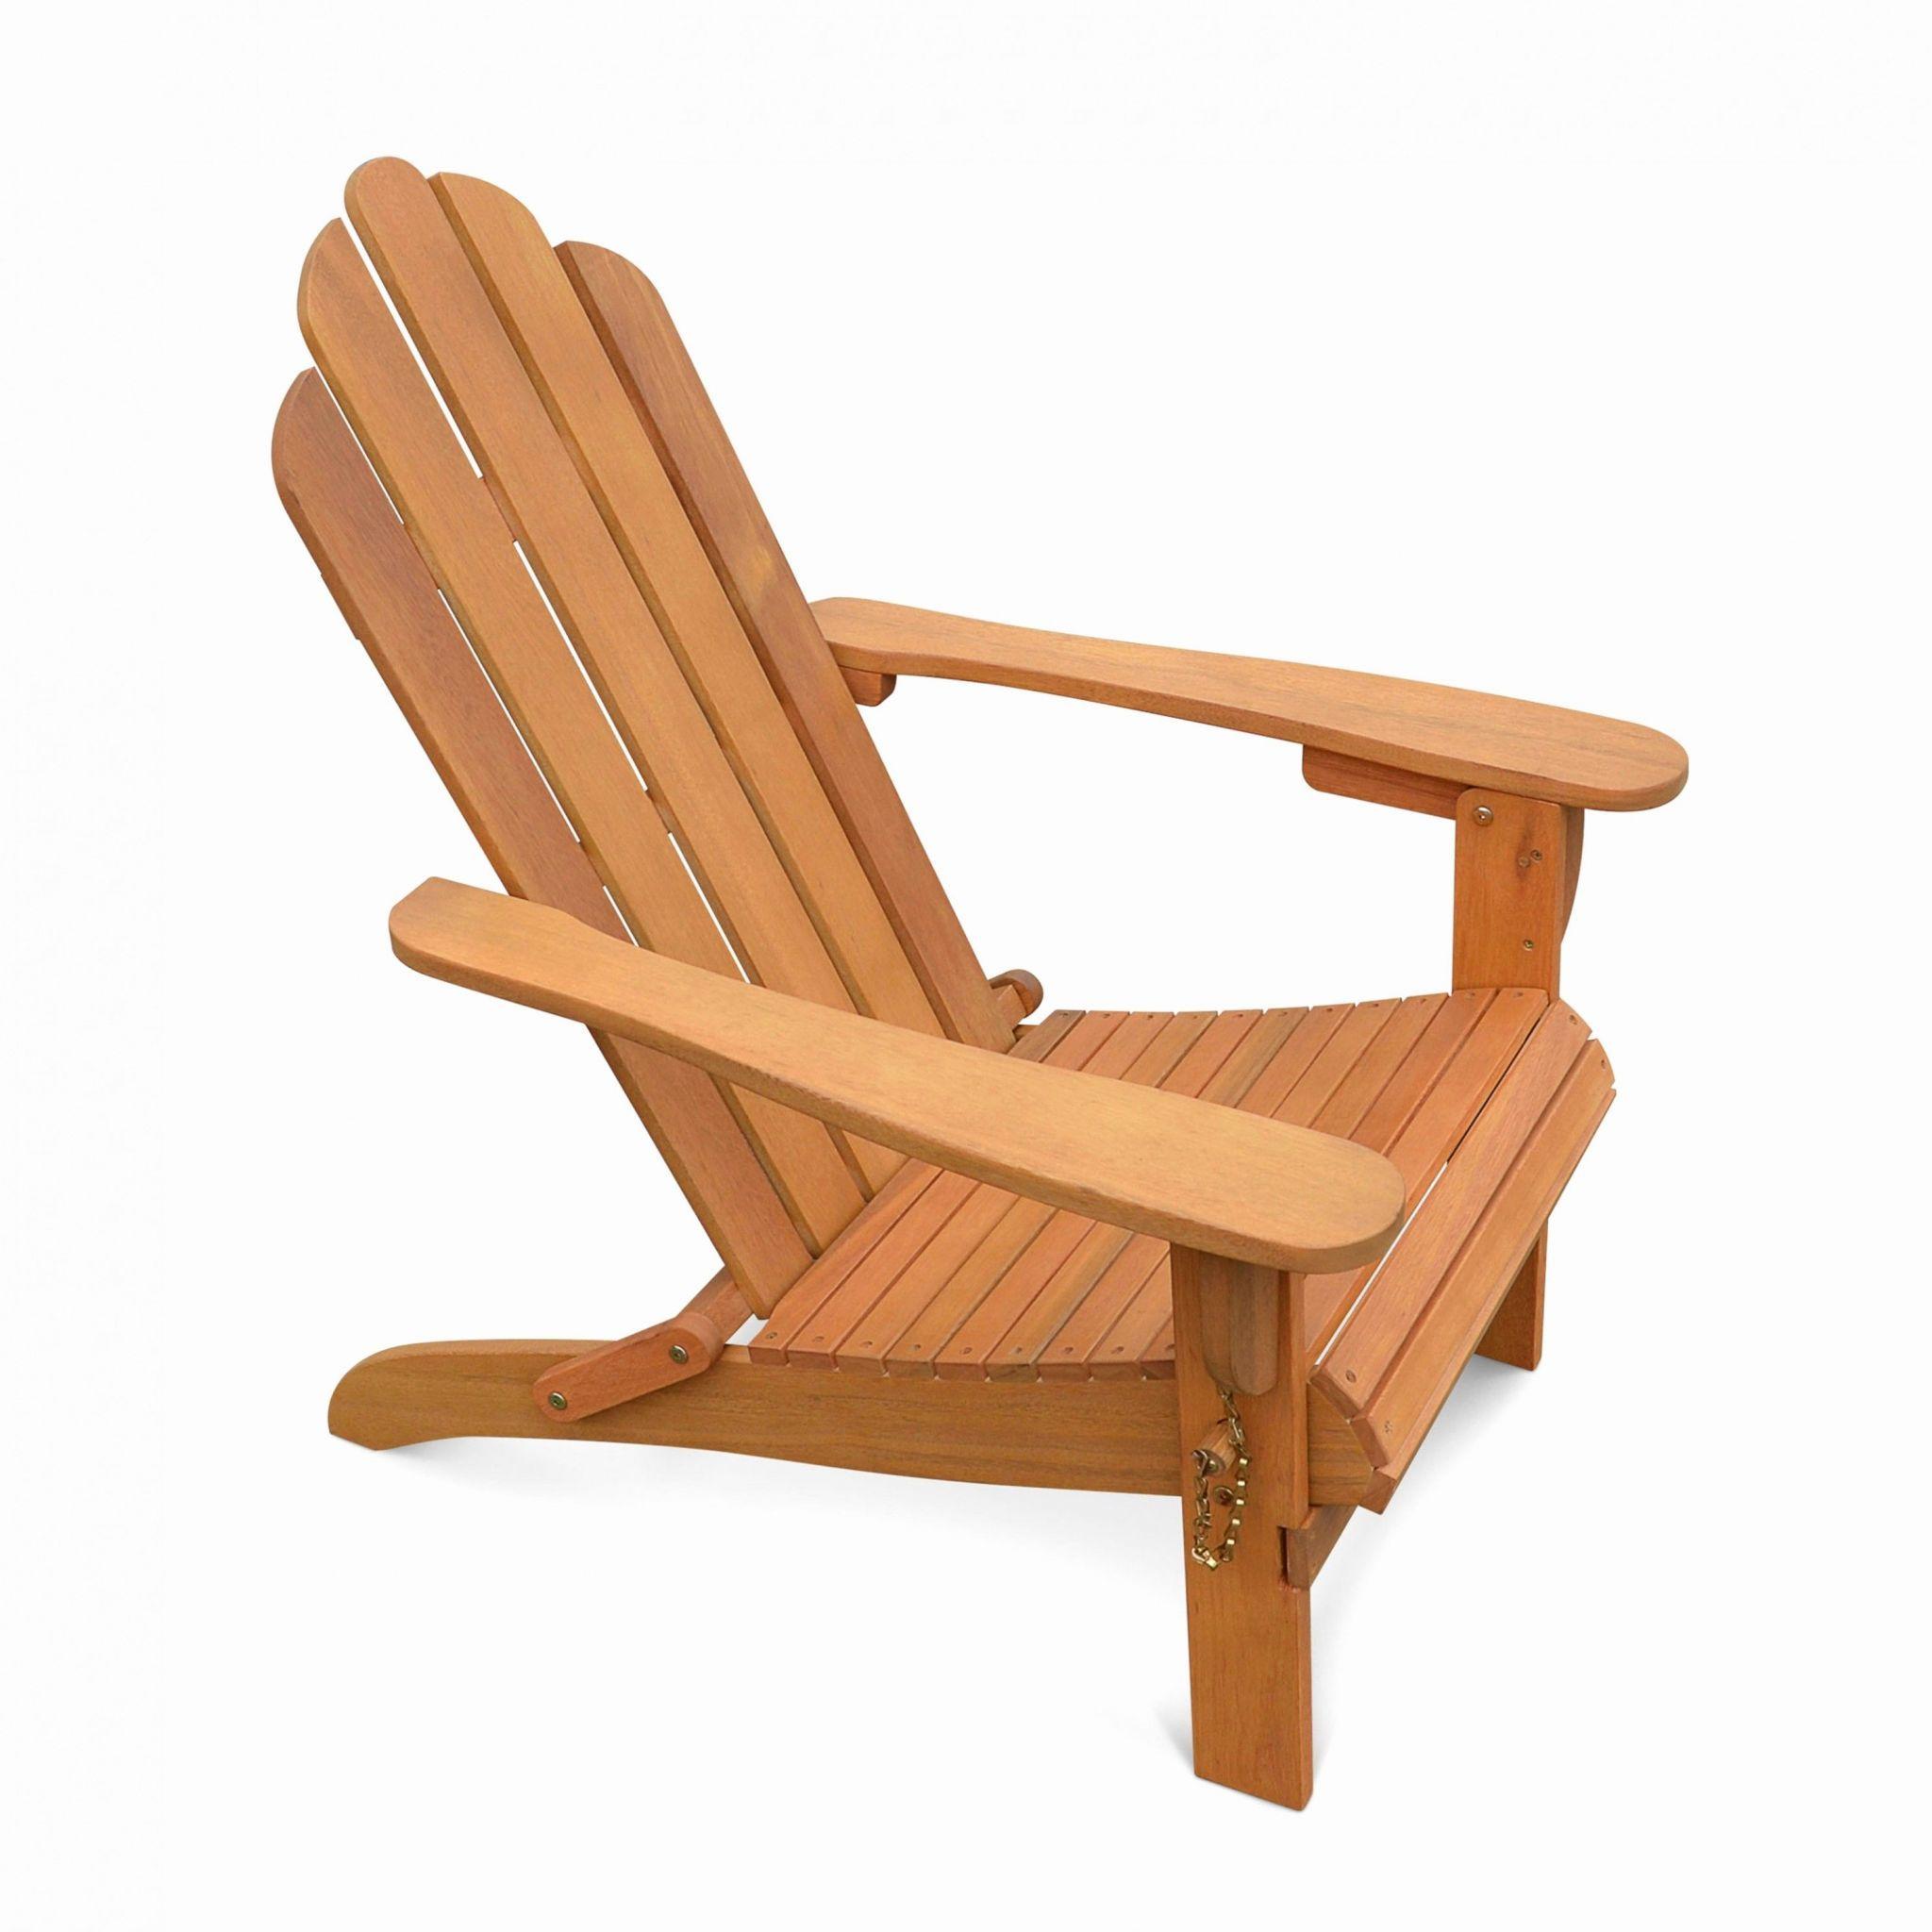 Chaise De Jardin Tissu In 2020 Folding Garden Chairs Upholstered Rocking Chairs Glider Chair